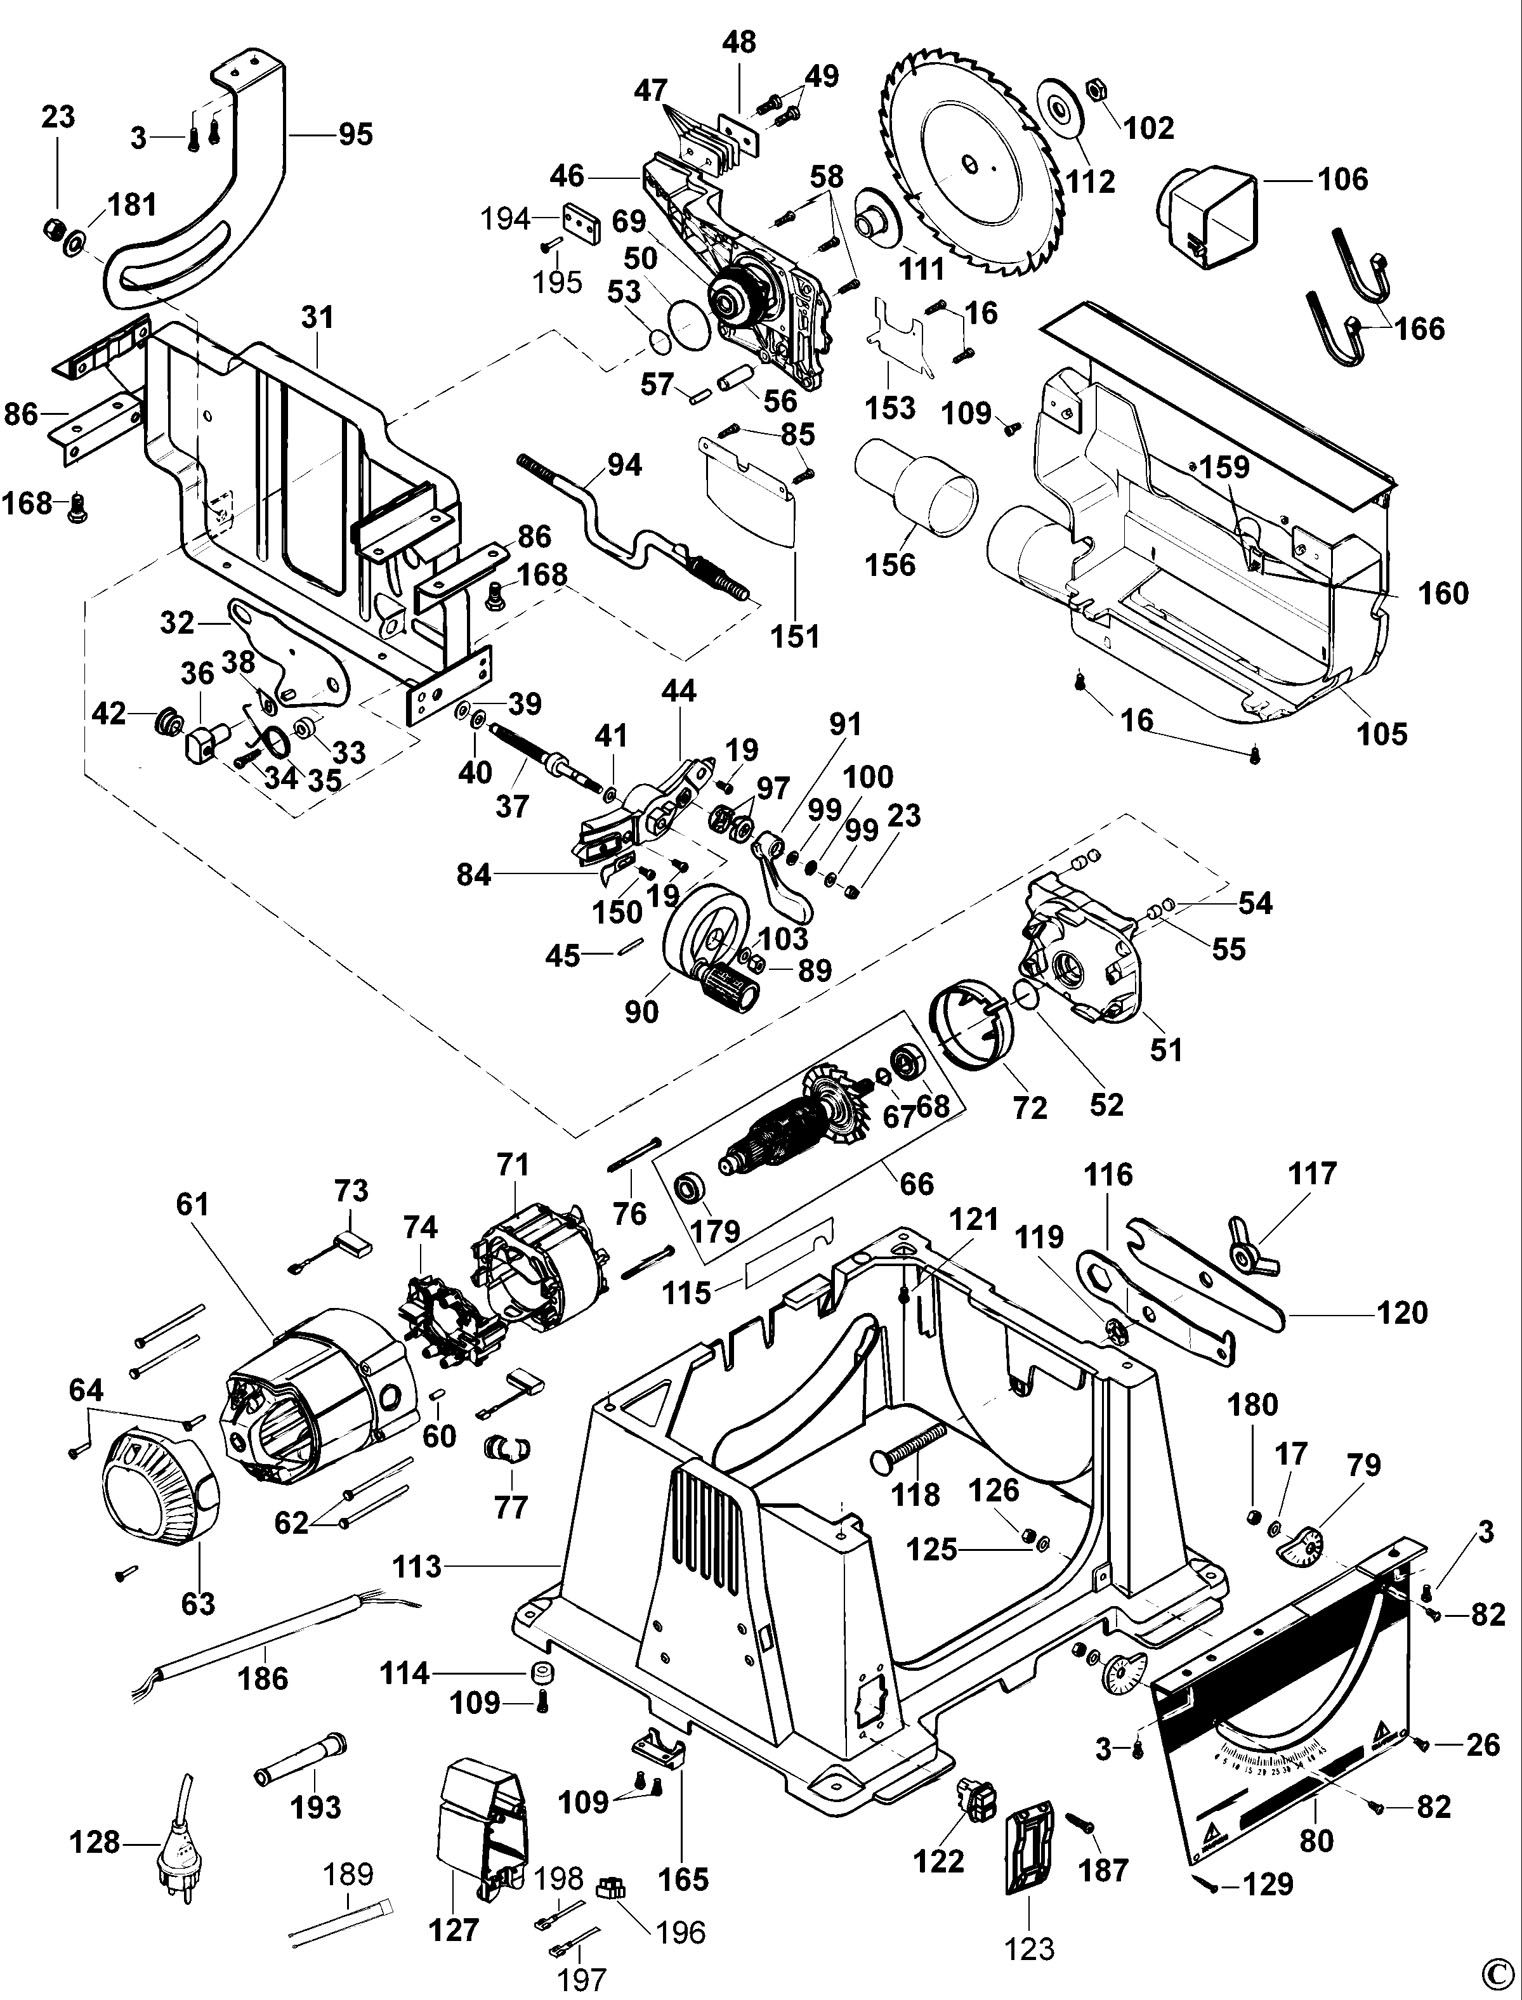 dewalt table saw parts diagram